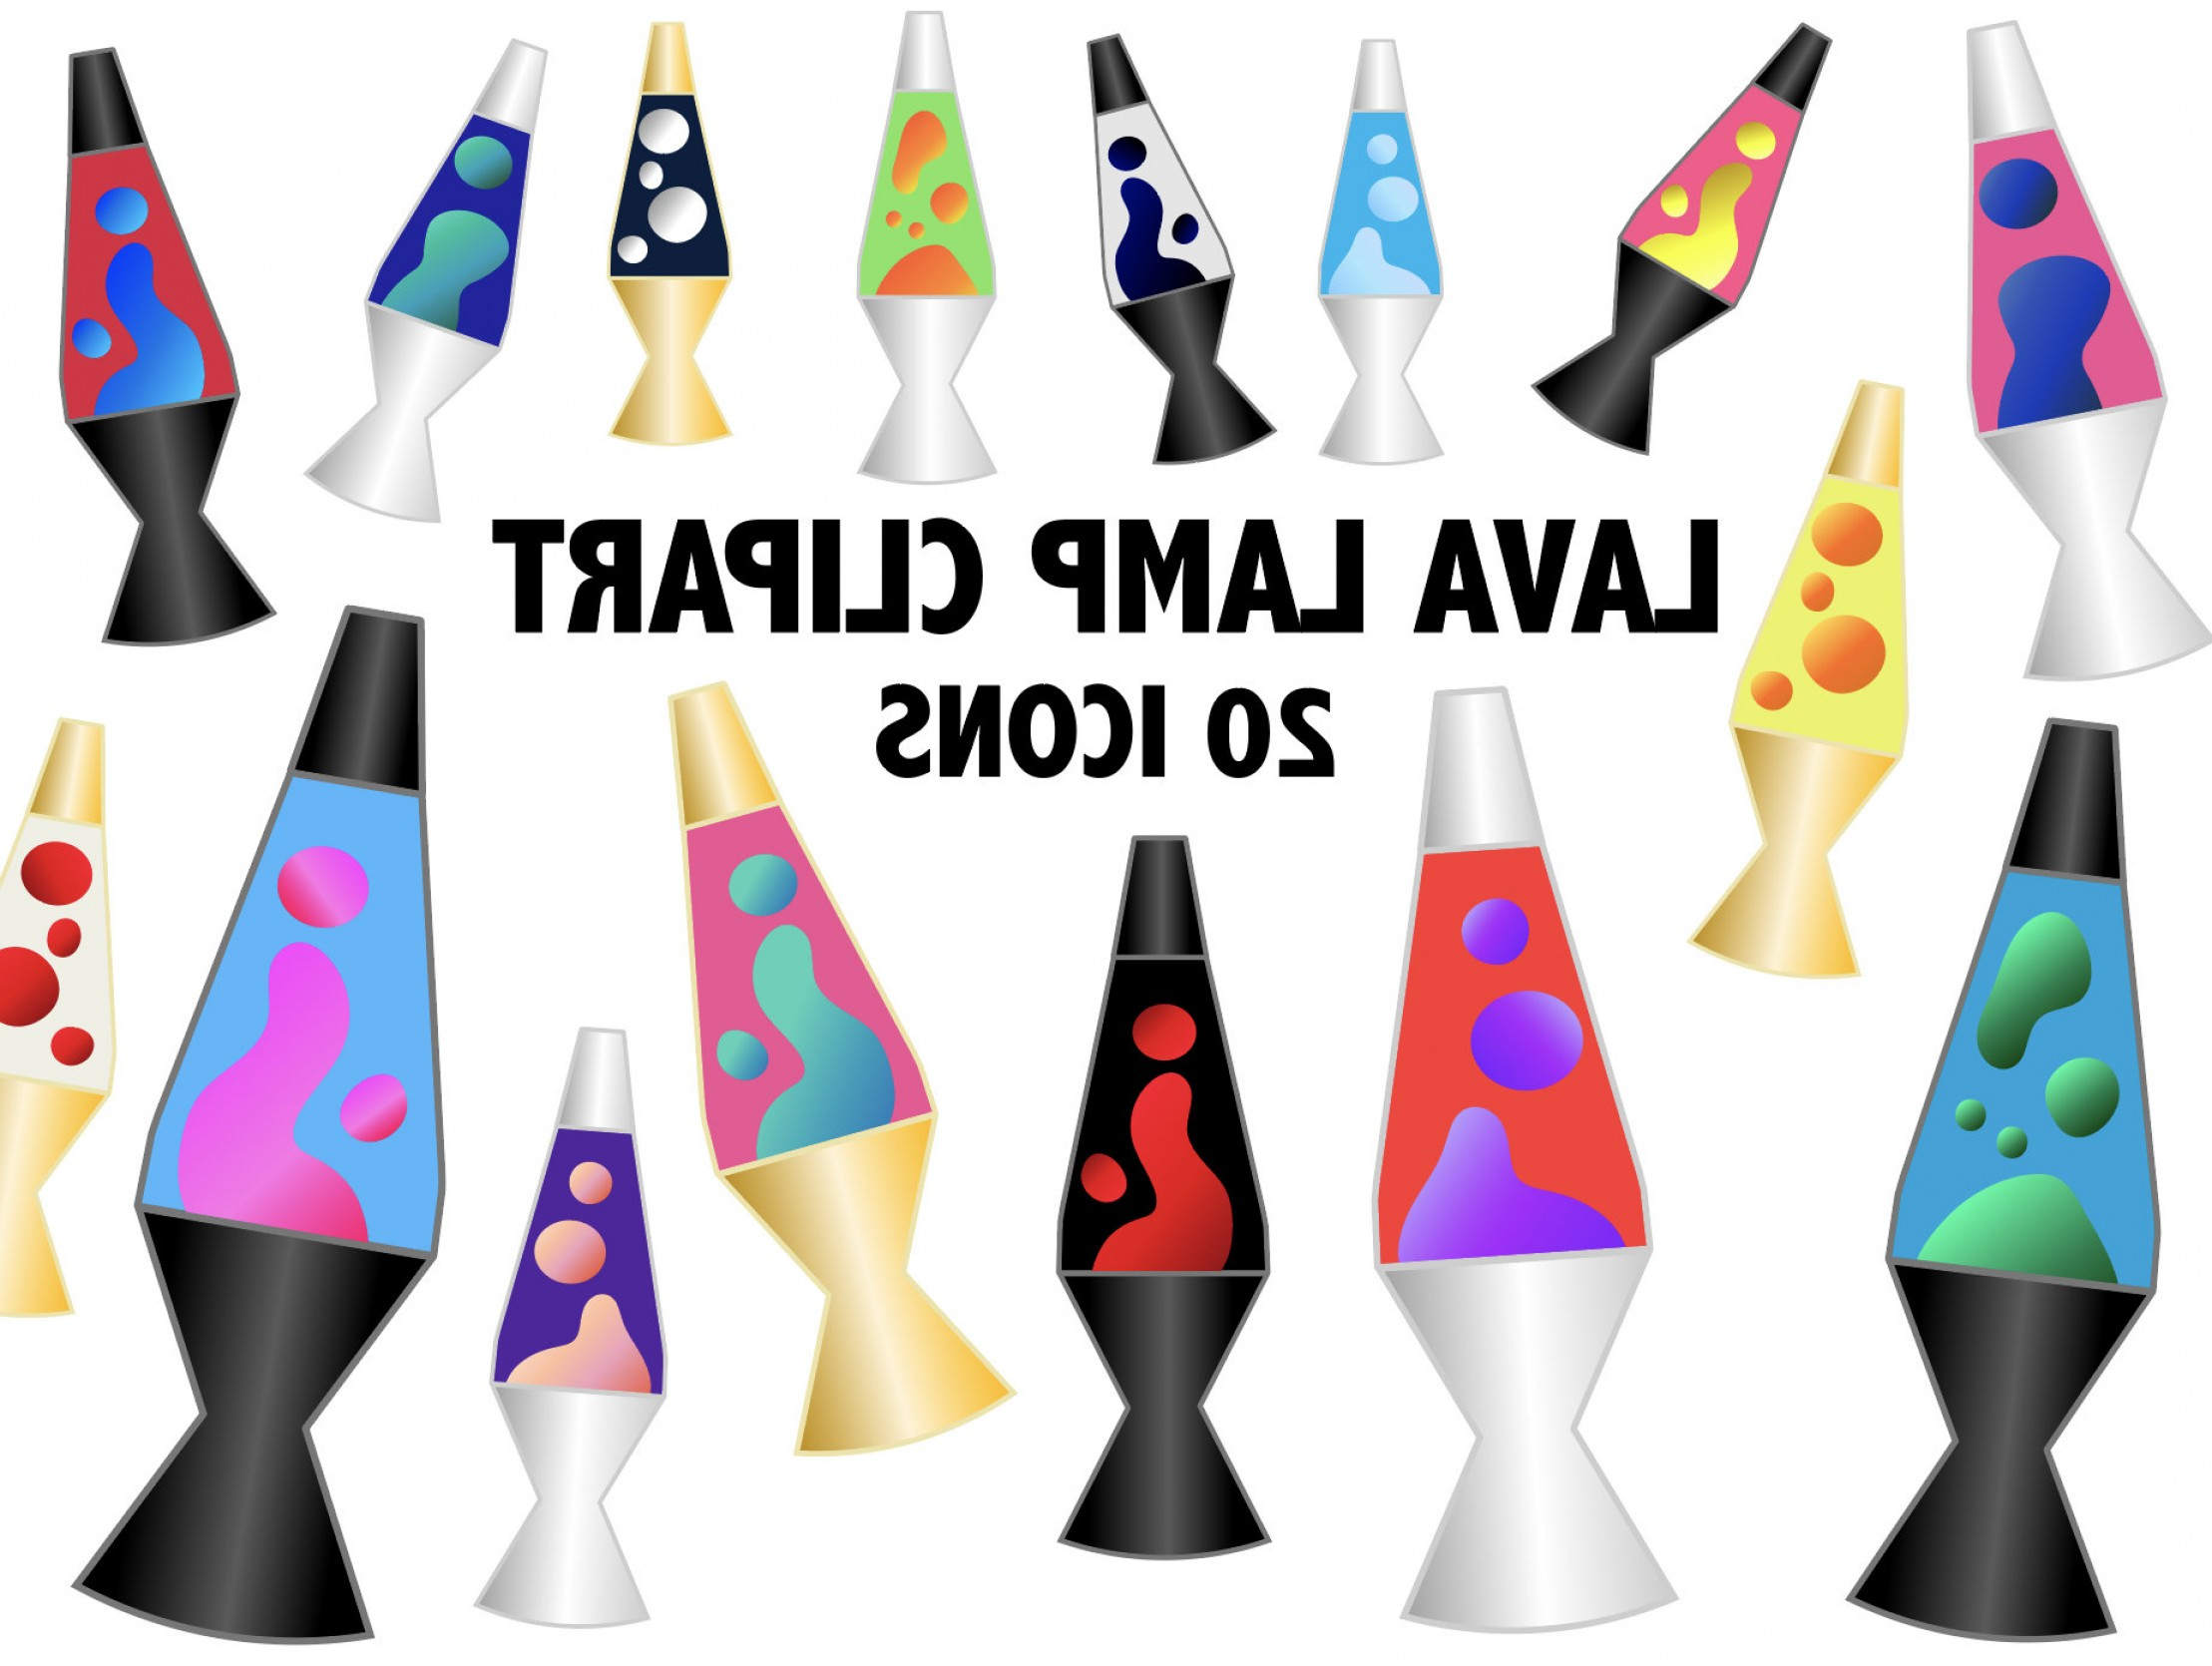 2217x1670 Lava Lamp Clipart Lava Lamp Icons S Shopatcloth